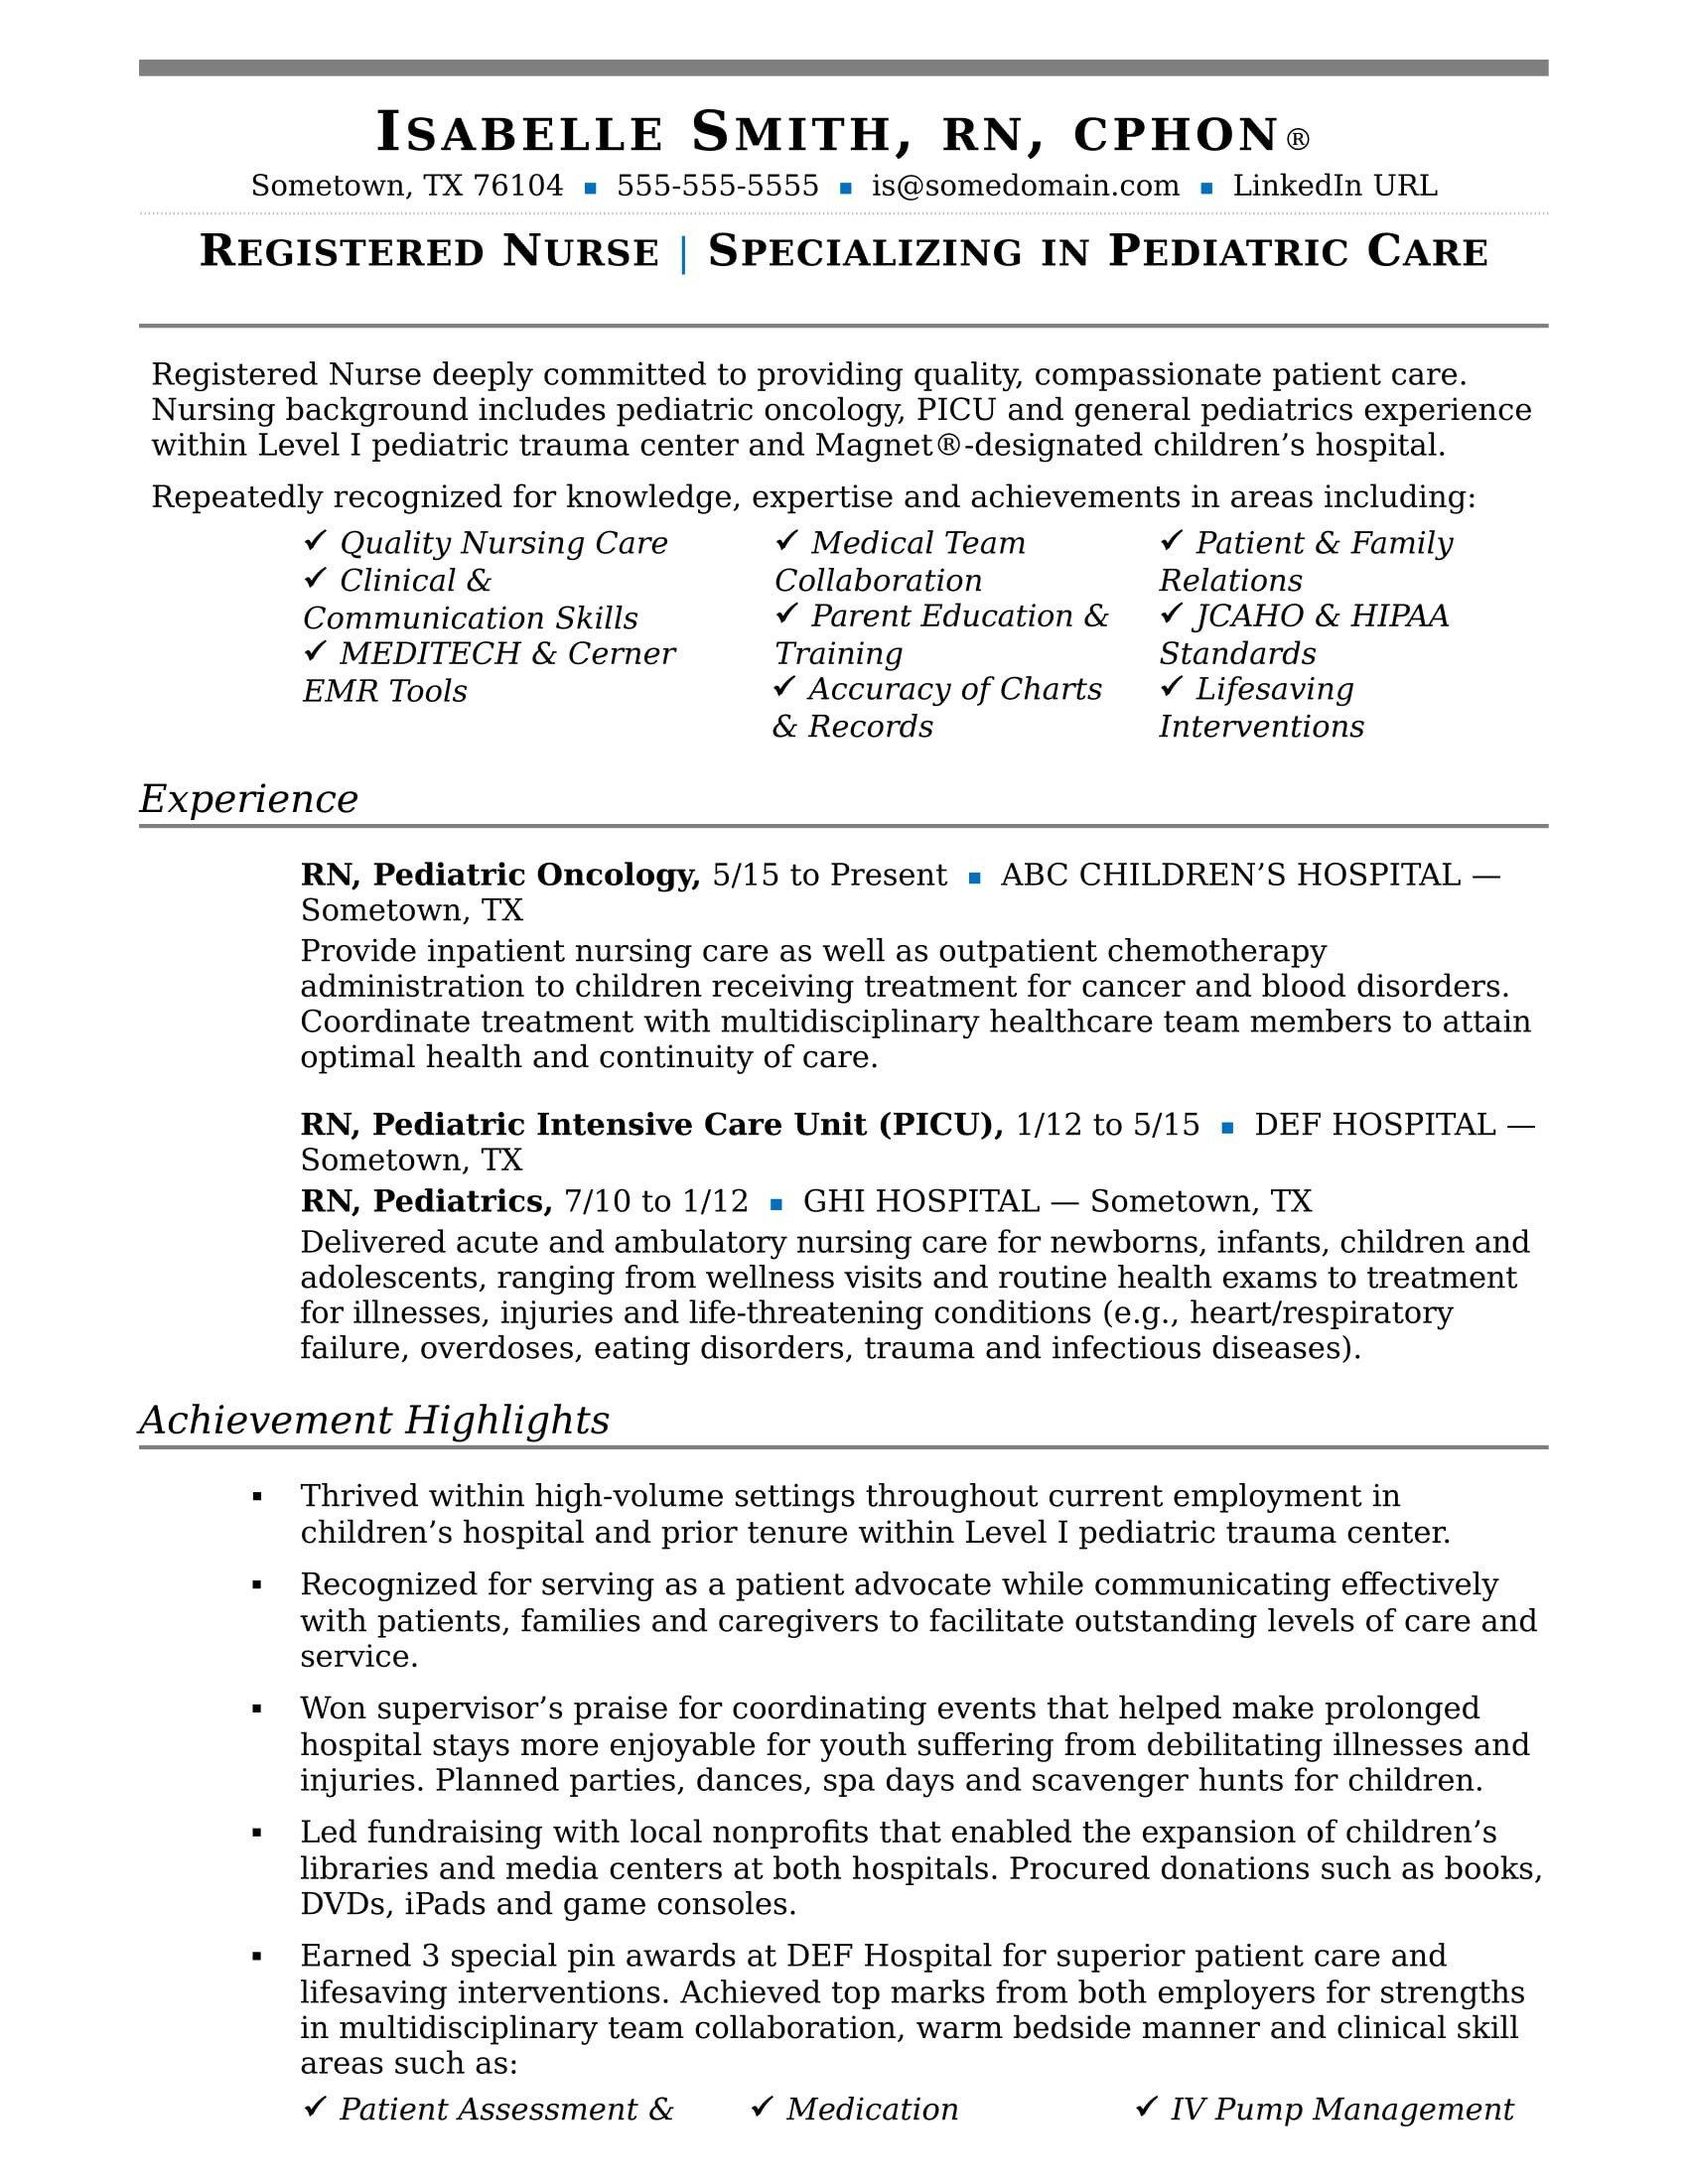 Resume Template for Nursing Nurse Resume Sample